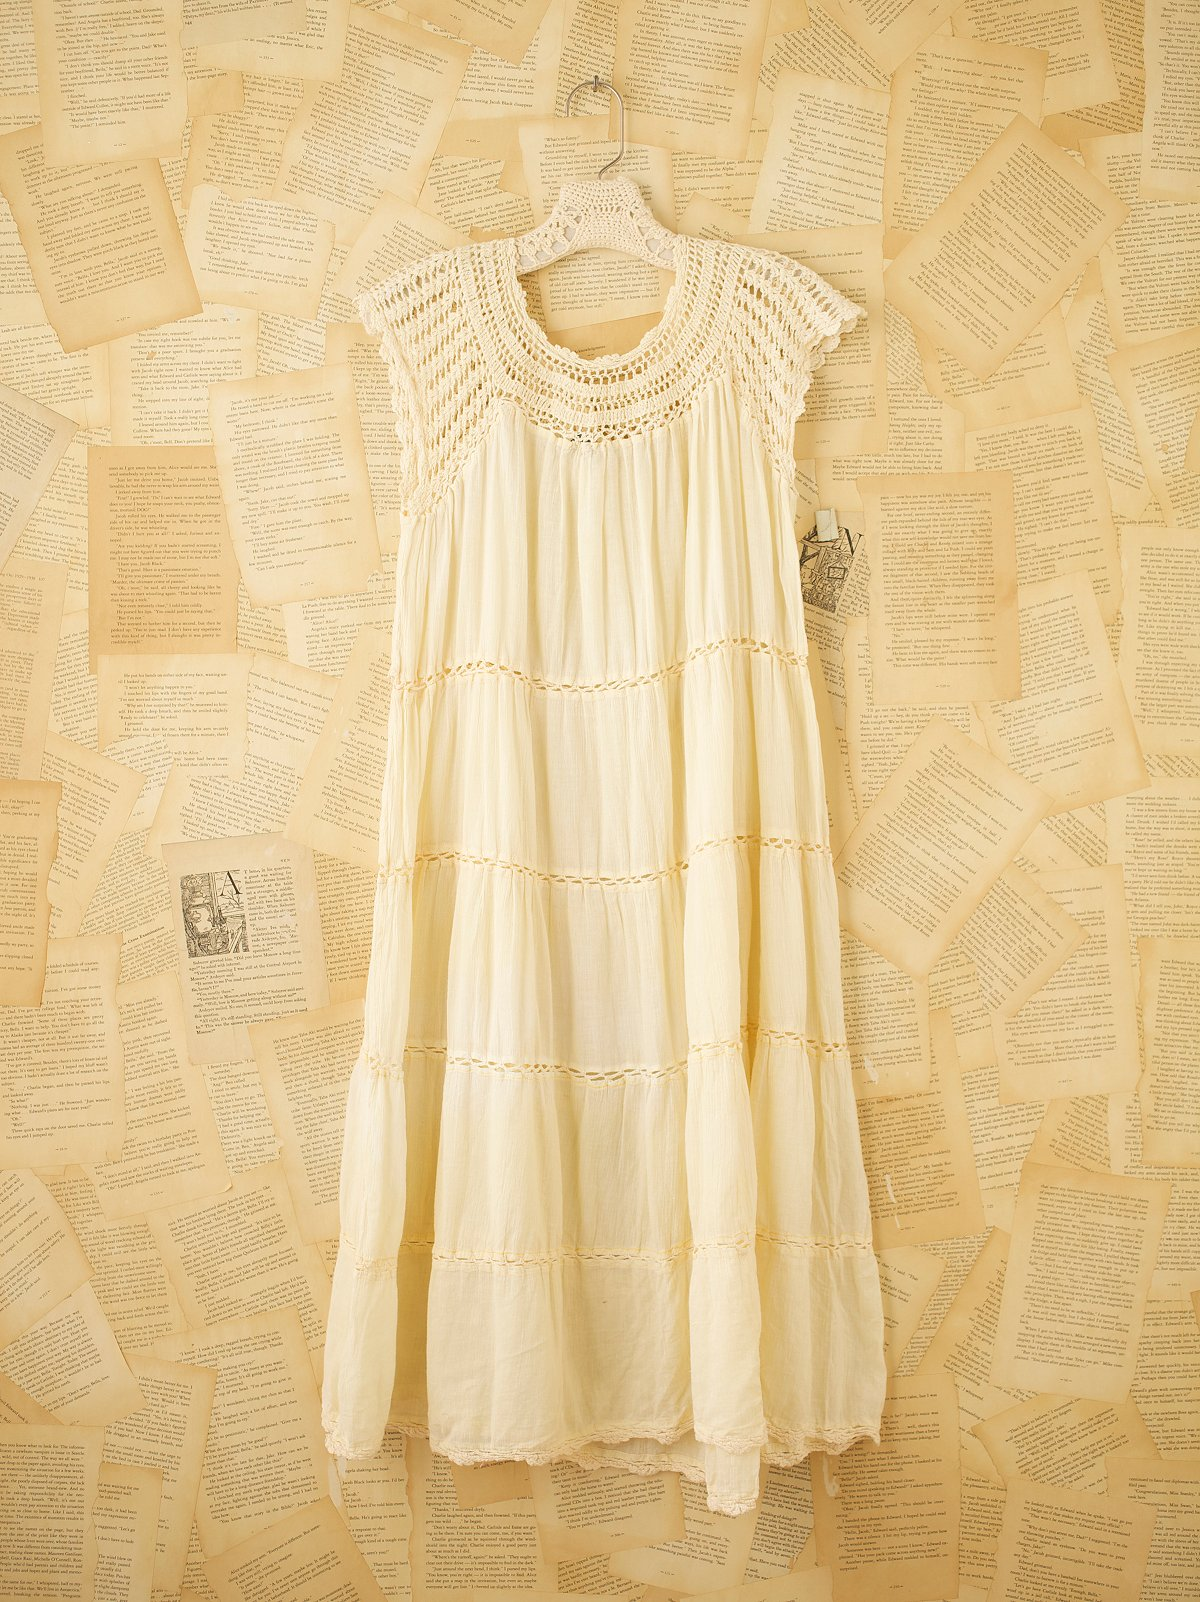 Vintage Gauze Tier Dress